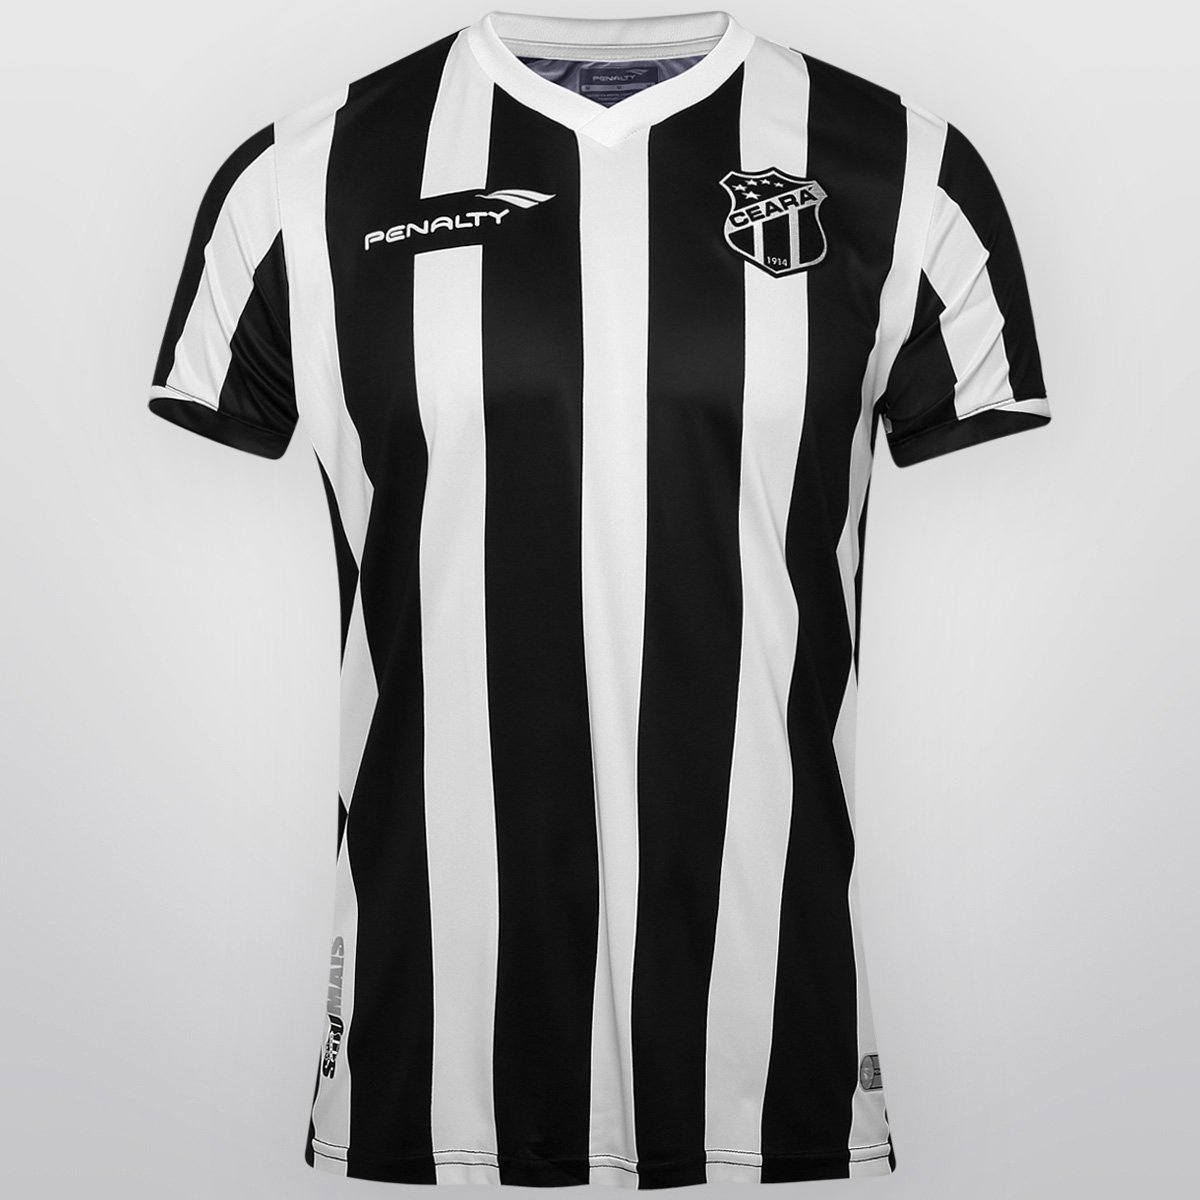 63a0e9e717 Camisa Penalty Ceará I 2015 nº 10 - Compre Agora